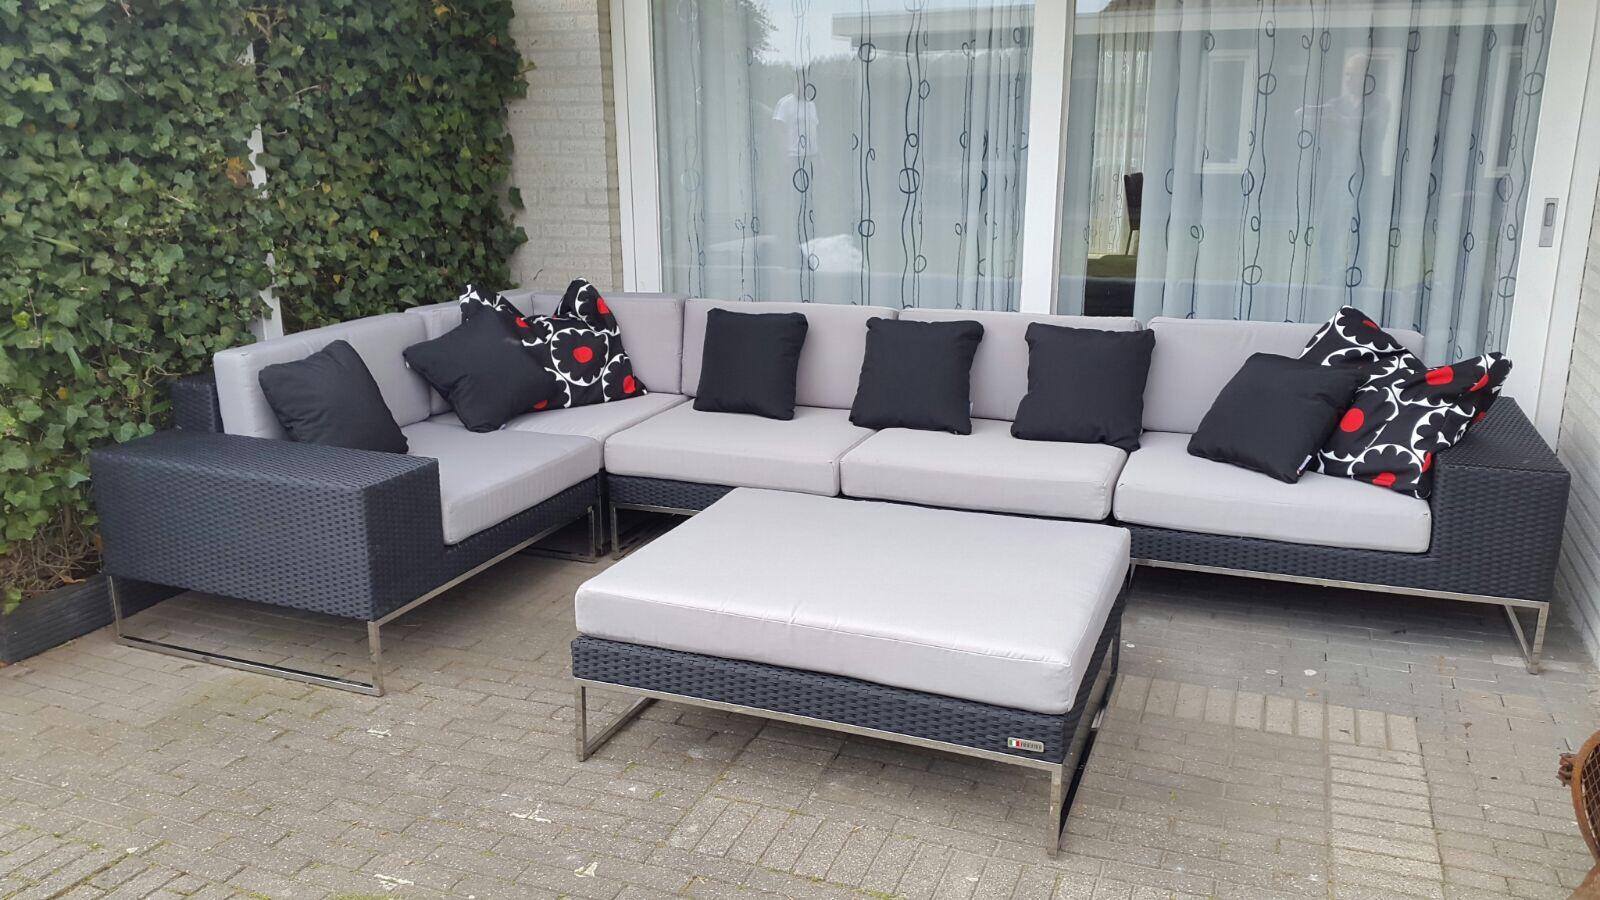 Lounge Bank Tuin : Arbrini design tuinmeubelen maart